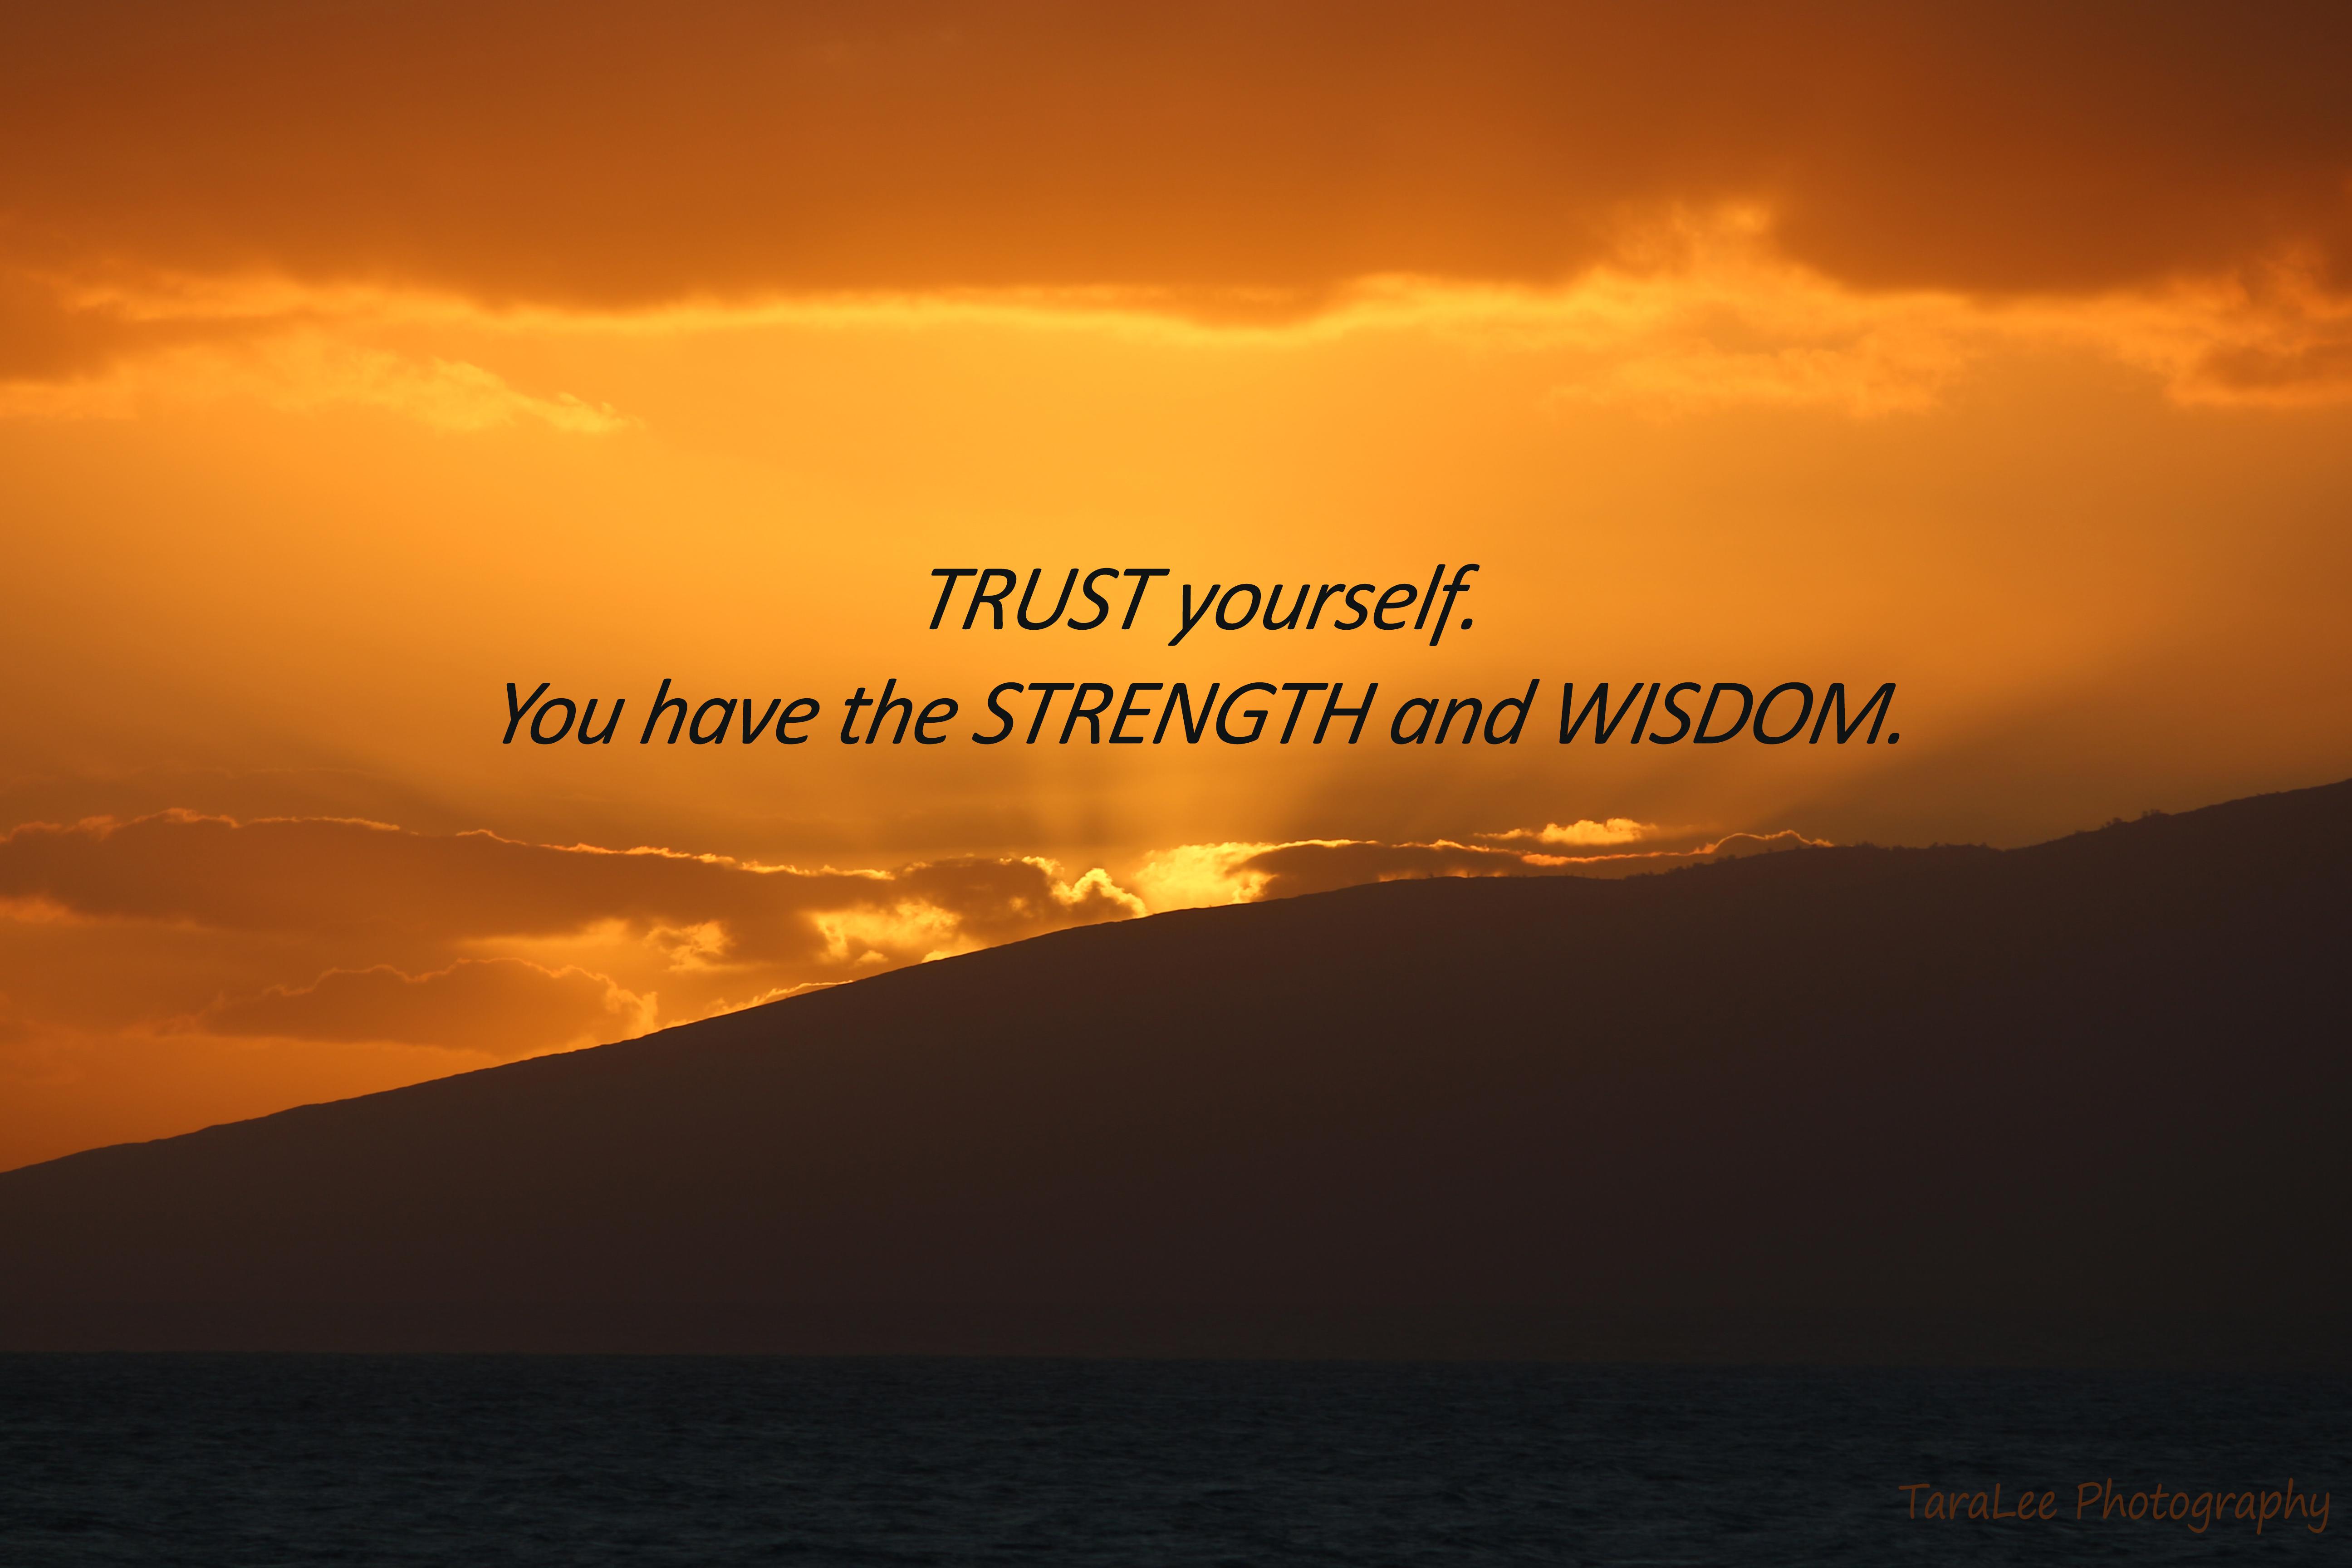 Short Positive Quotes - TSW Life Coaching